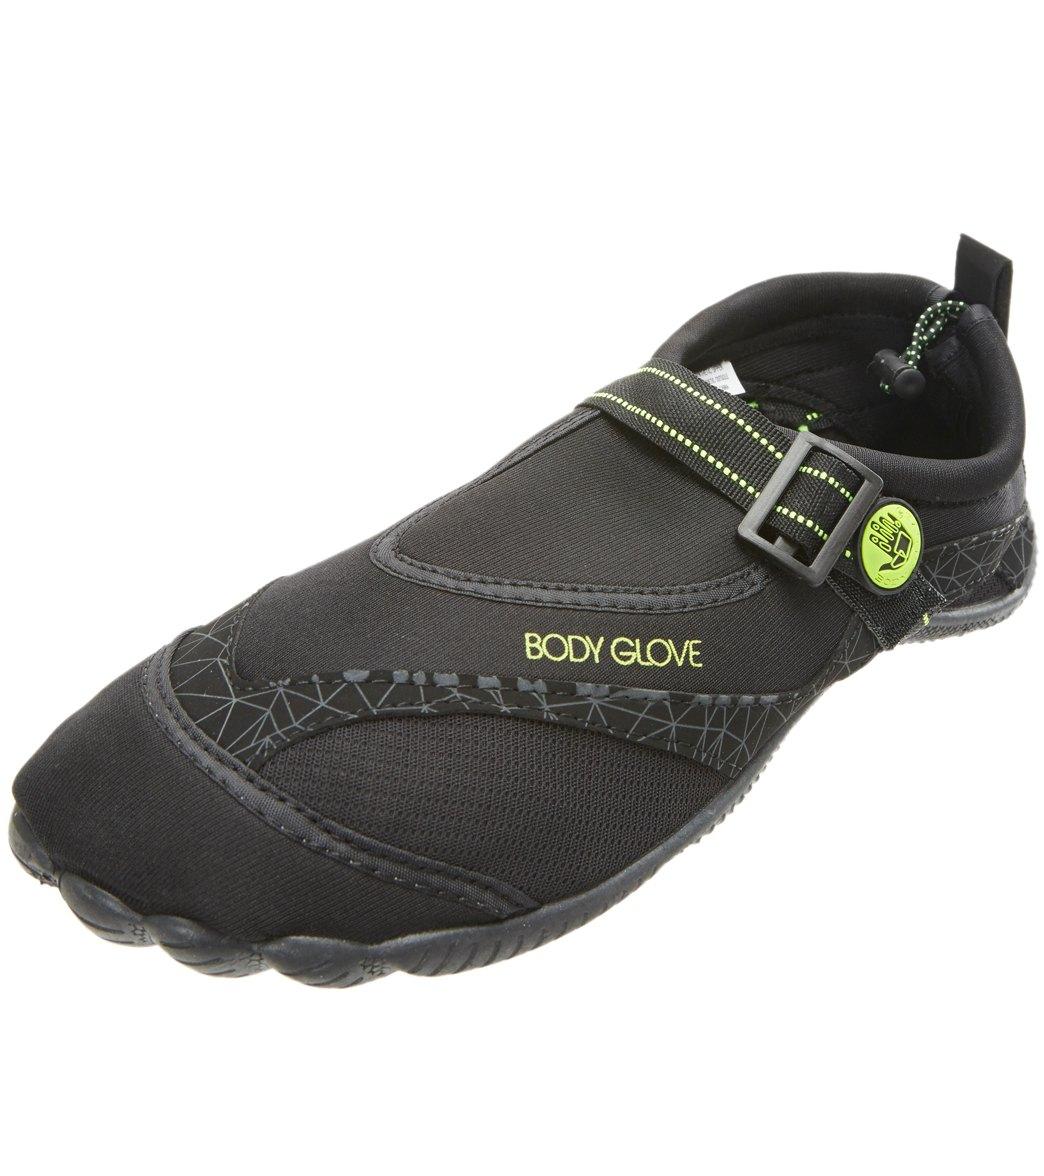 2176e540b4b0 Body Glove Men s Realm Water Shoe at SwimOutlet.com